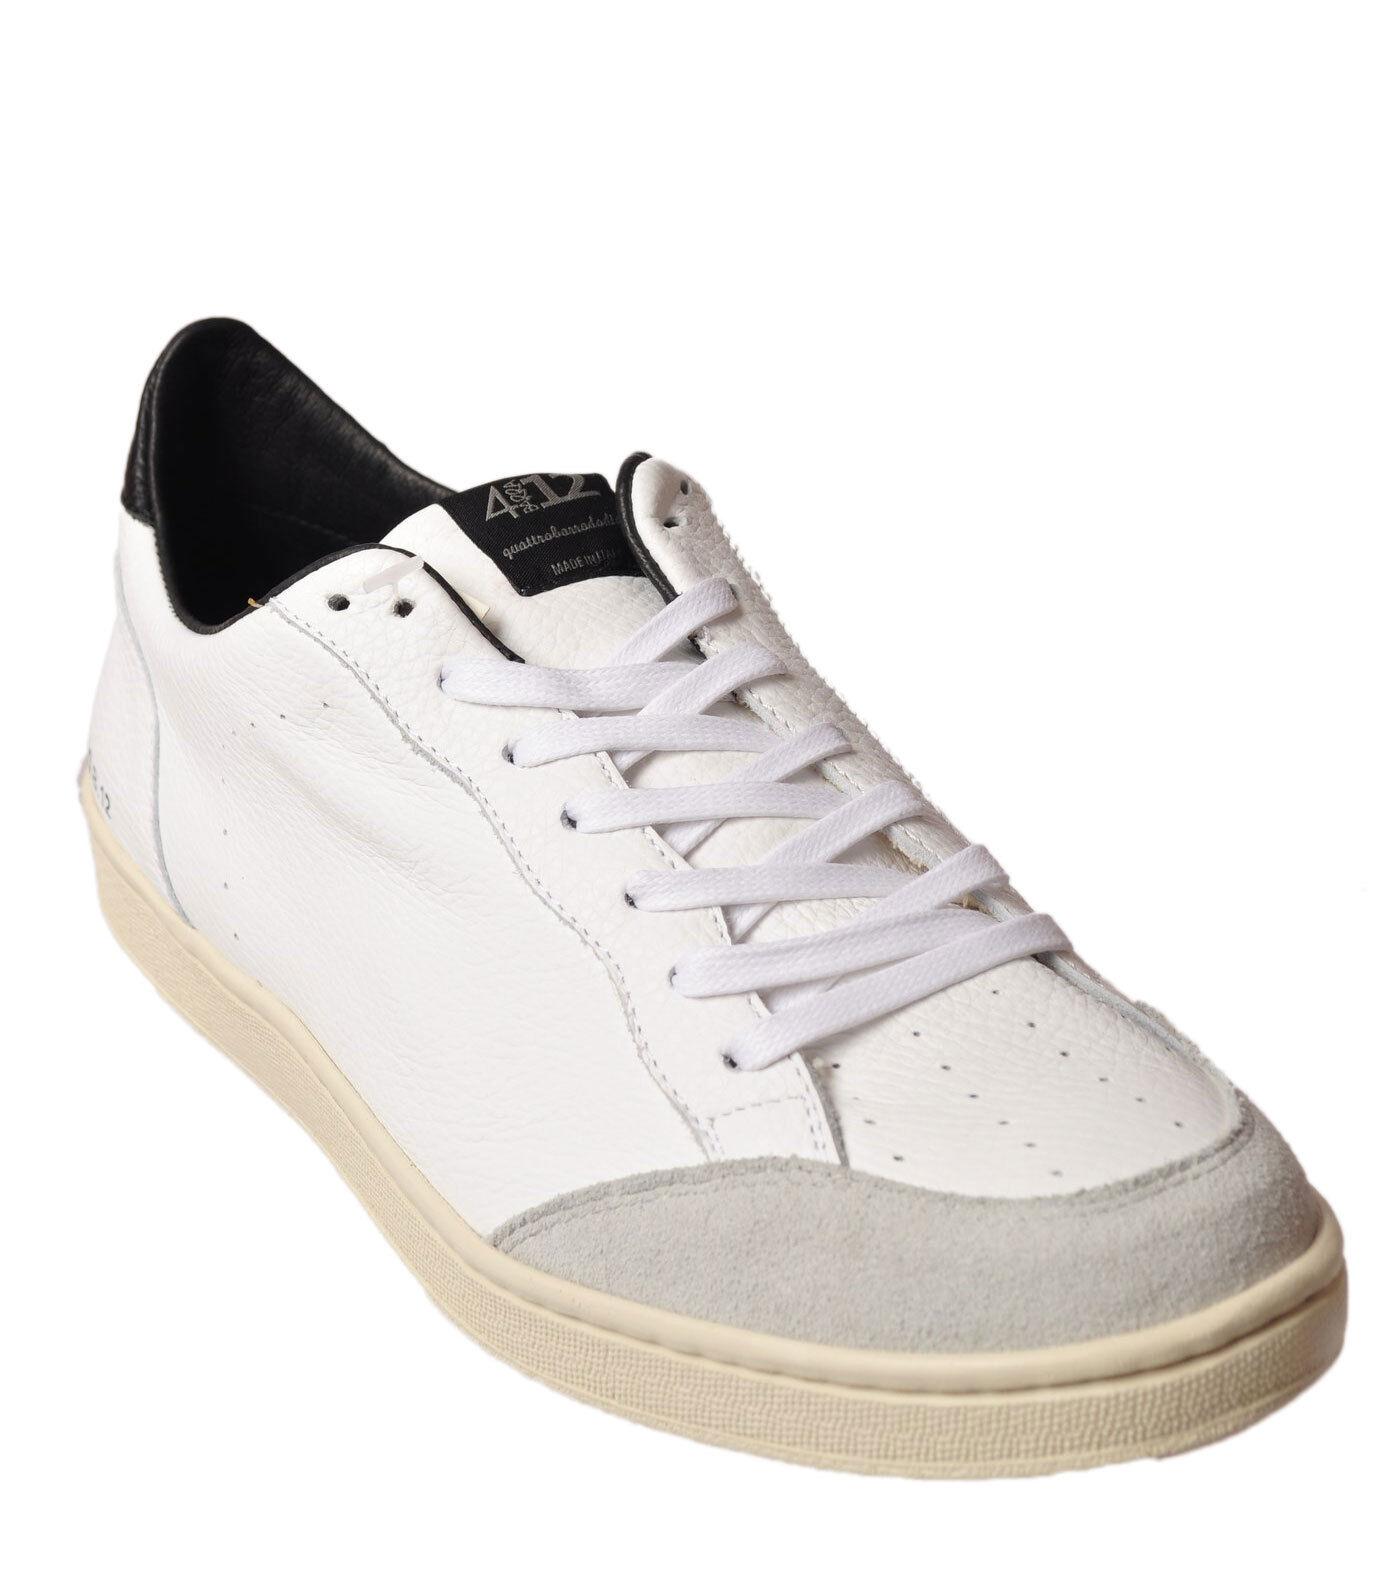 Quattrobarradodici - shoes-Sneakers low - Man - White - 49715N184241